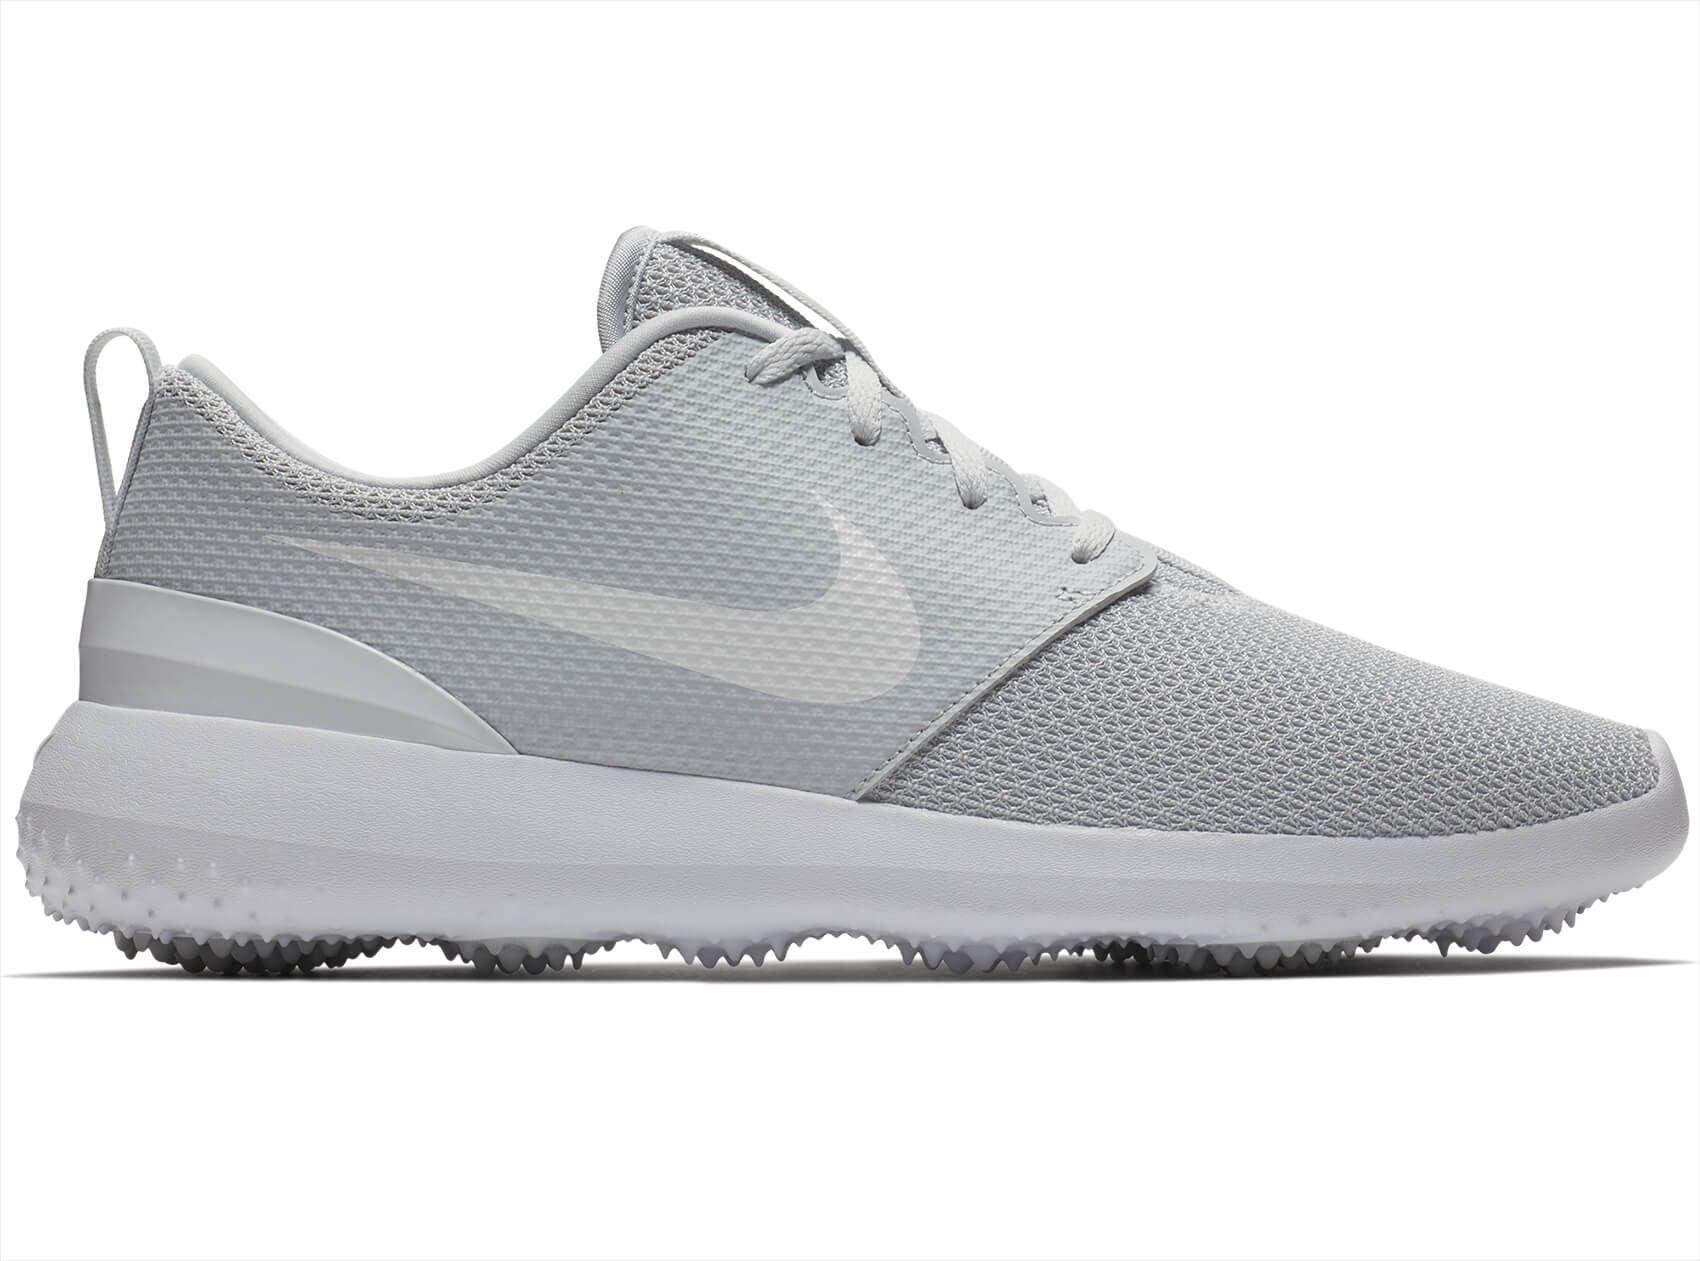 Nike Roshe G Golf Shoes Platinum White Carl S Golfland